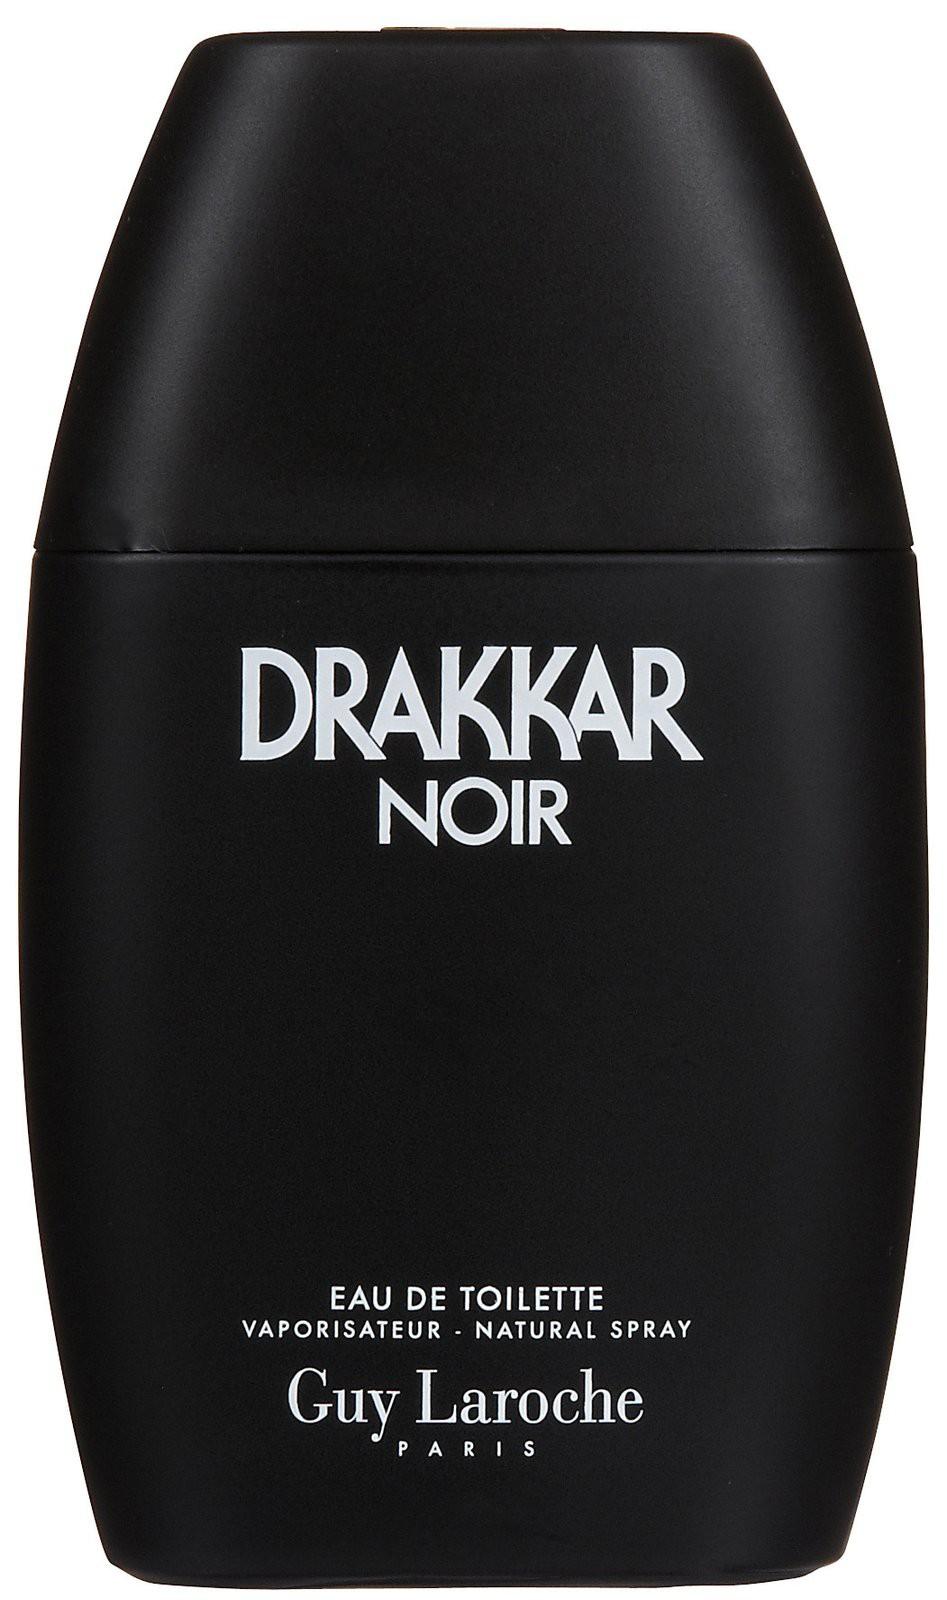 Guy Laroche Drakkar Noir аромат для мужчин